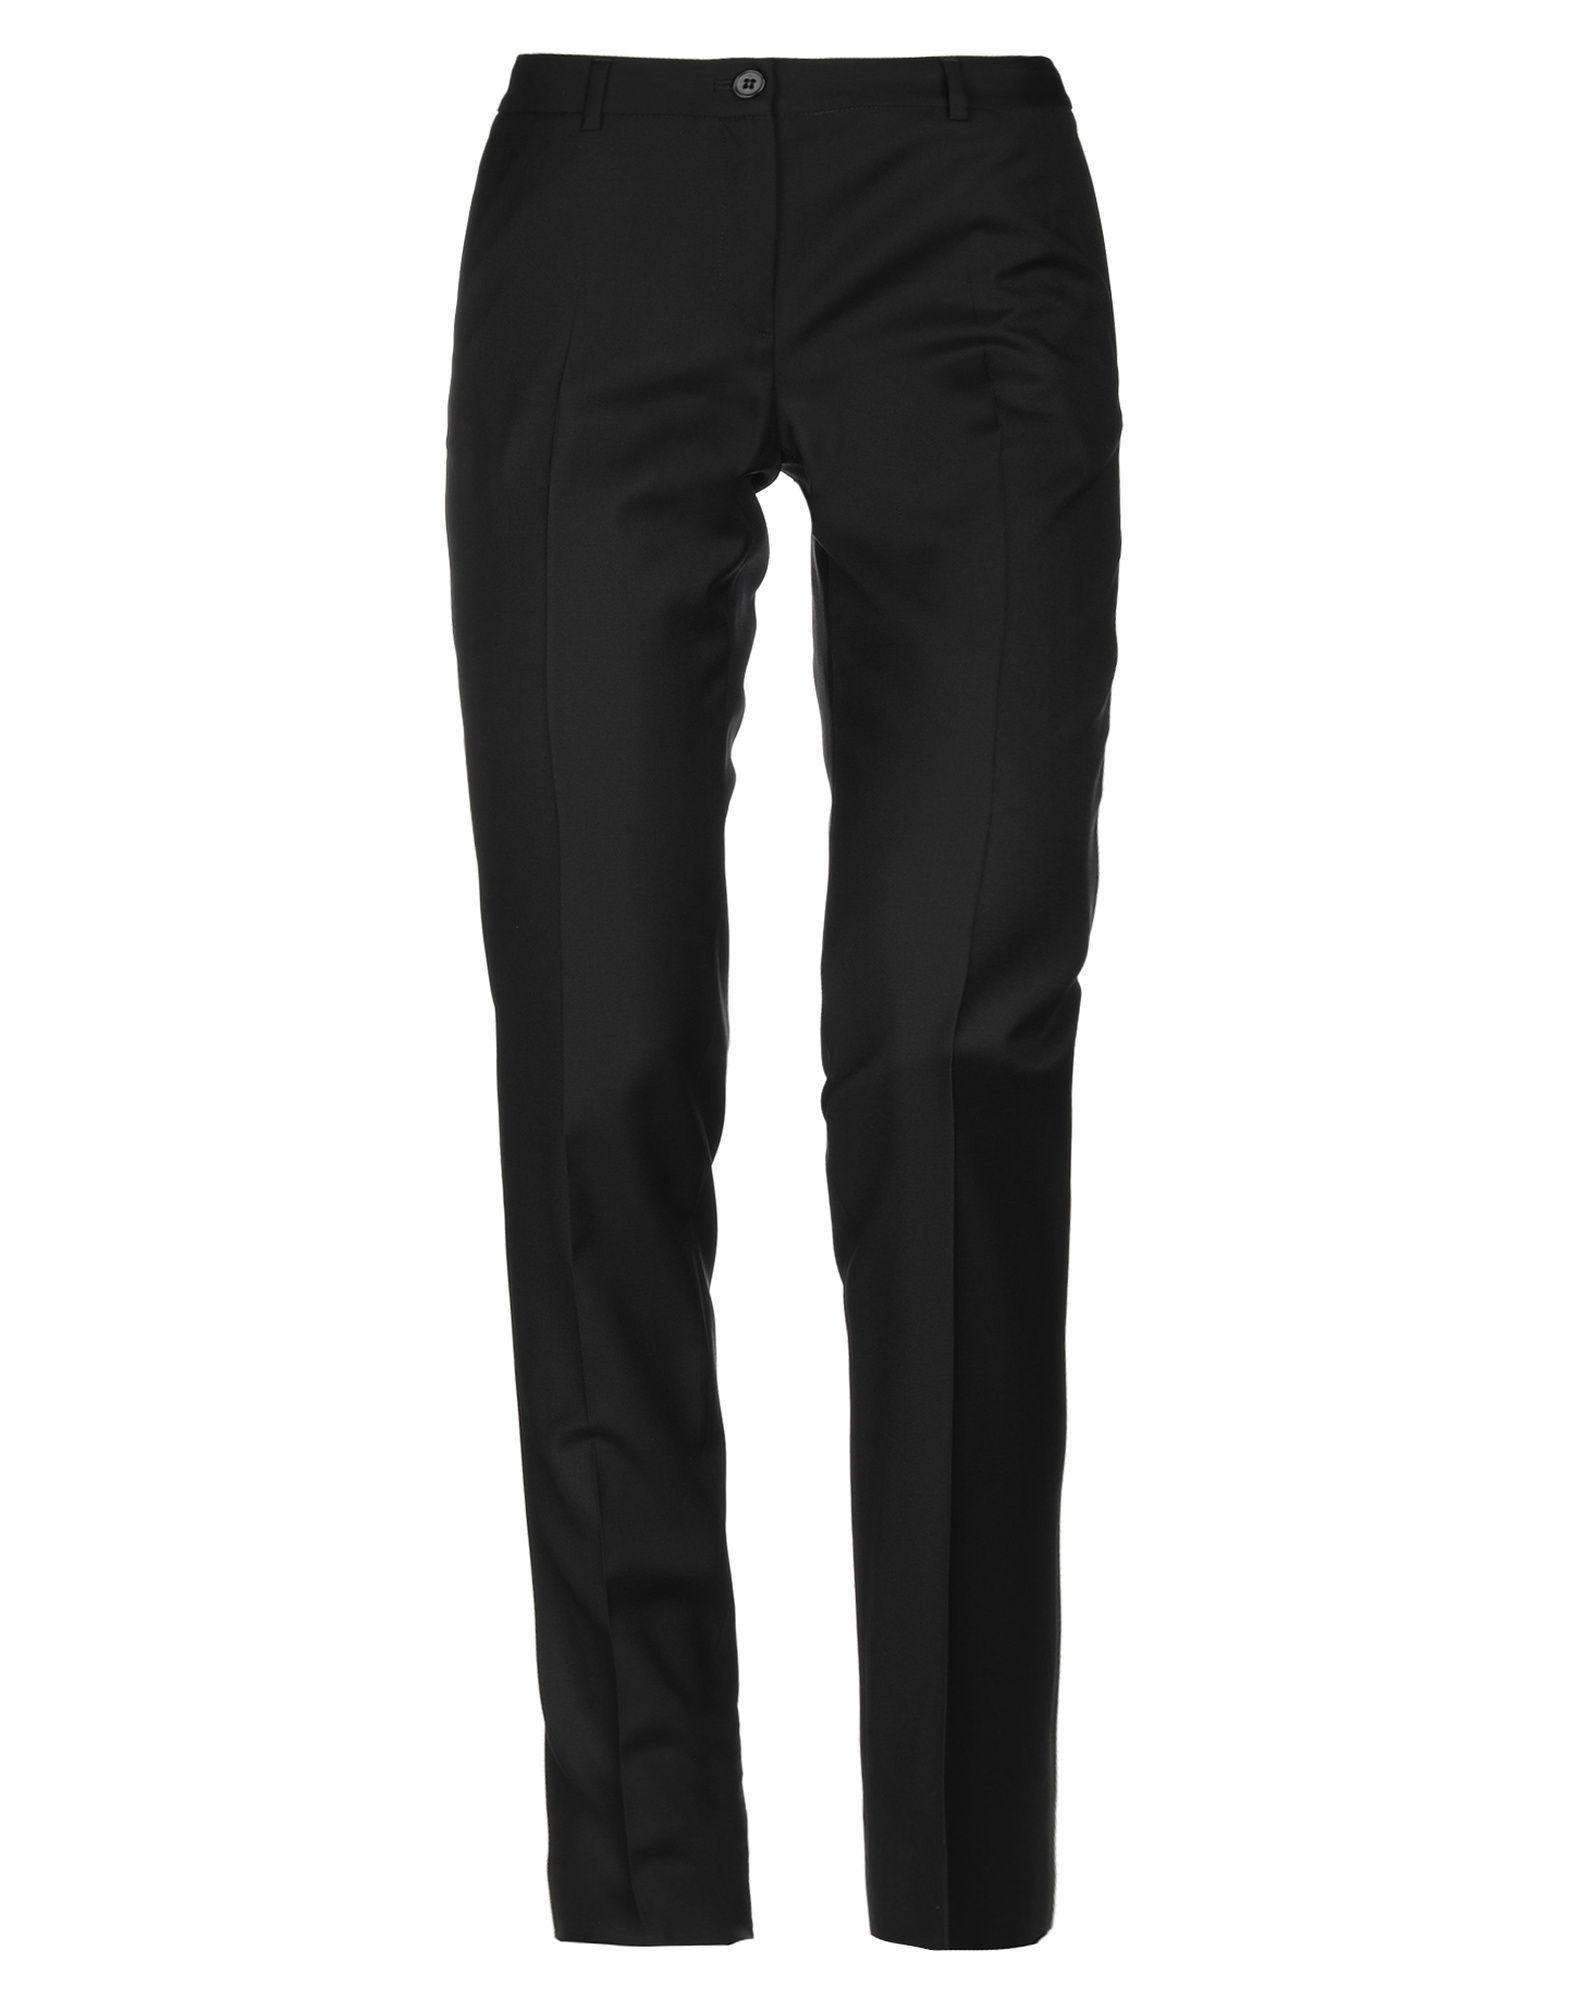 Mauro Grifoni Black Wool Trousers